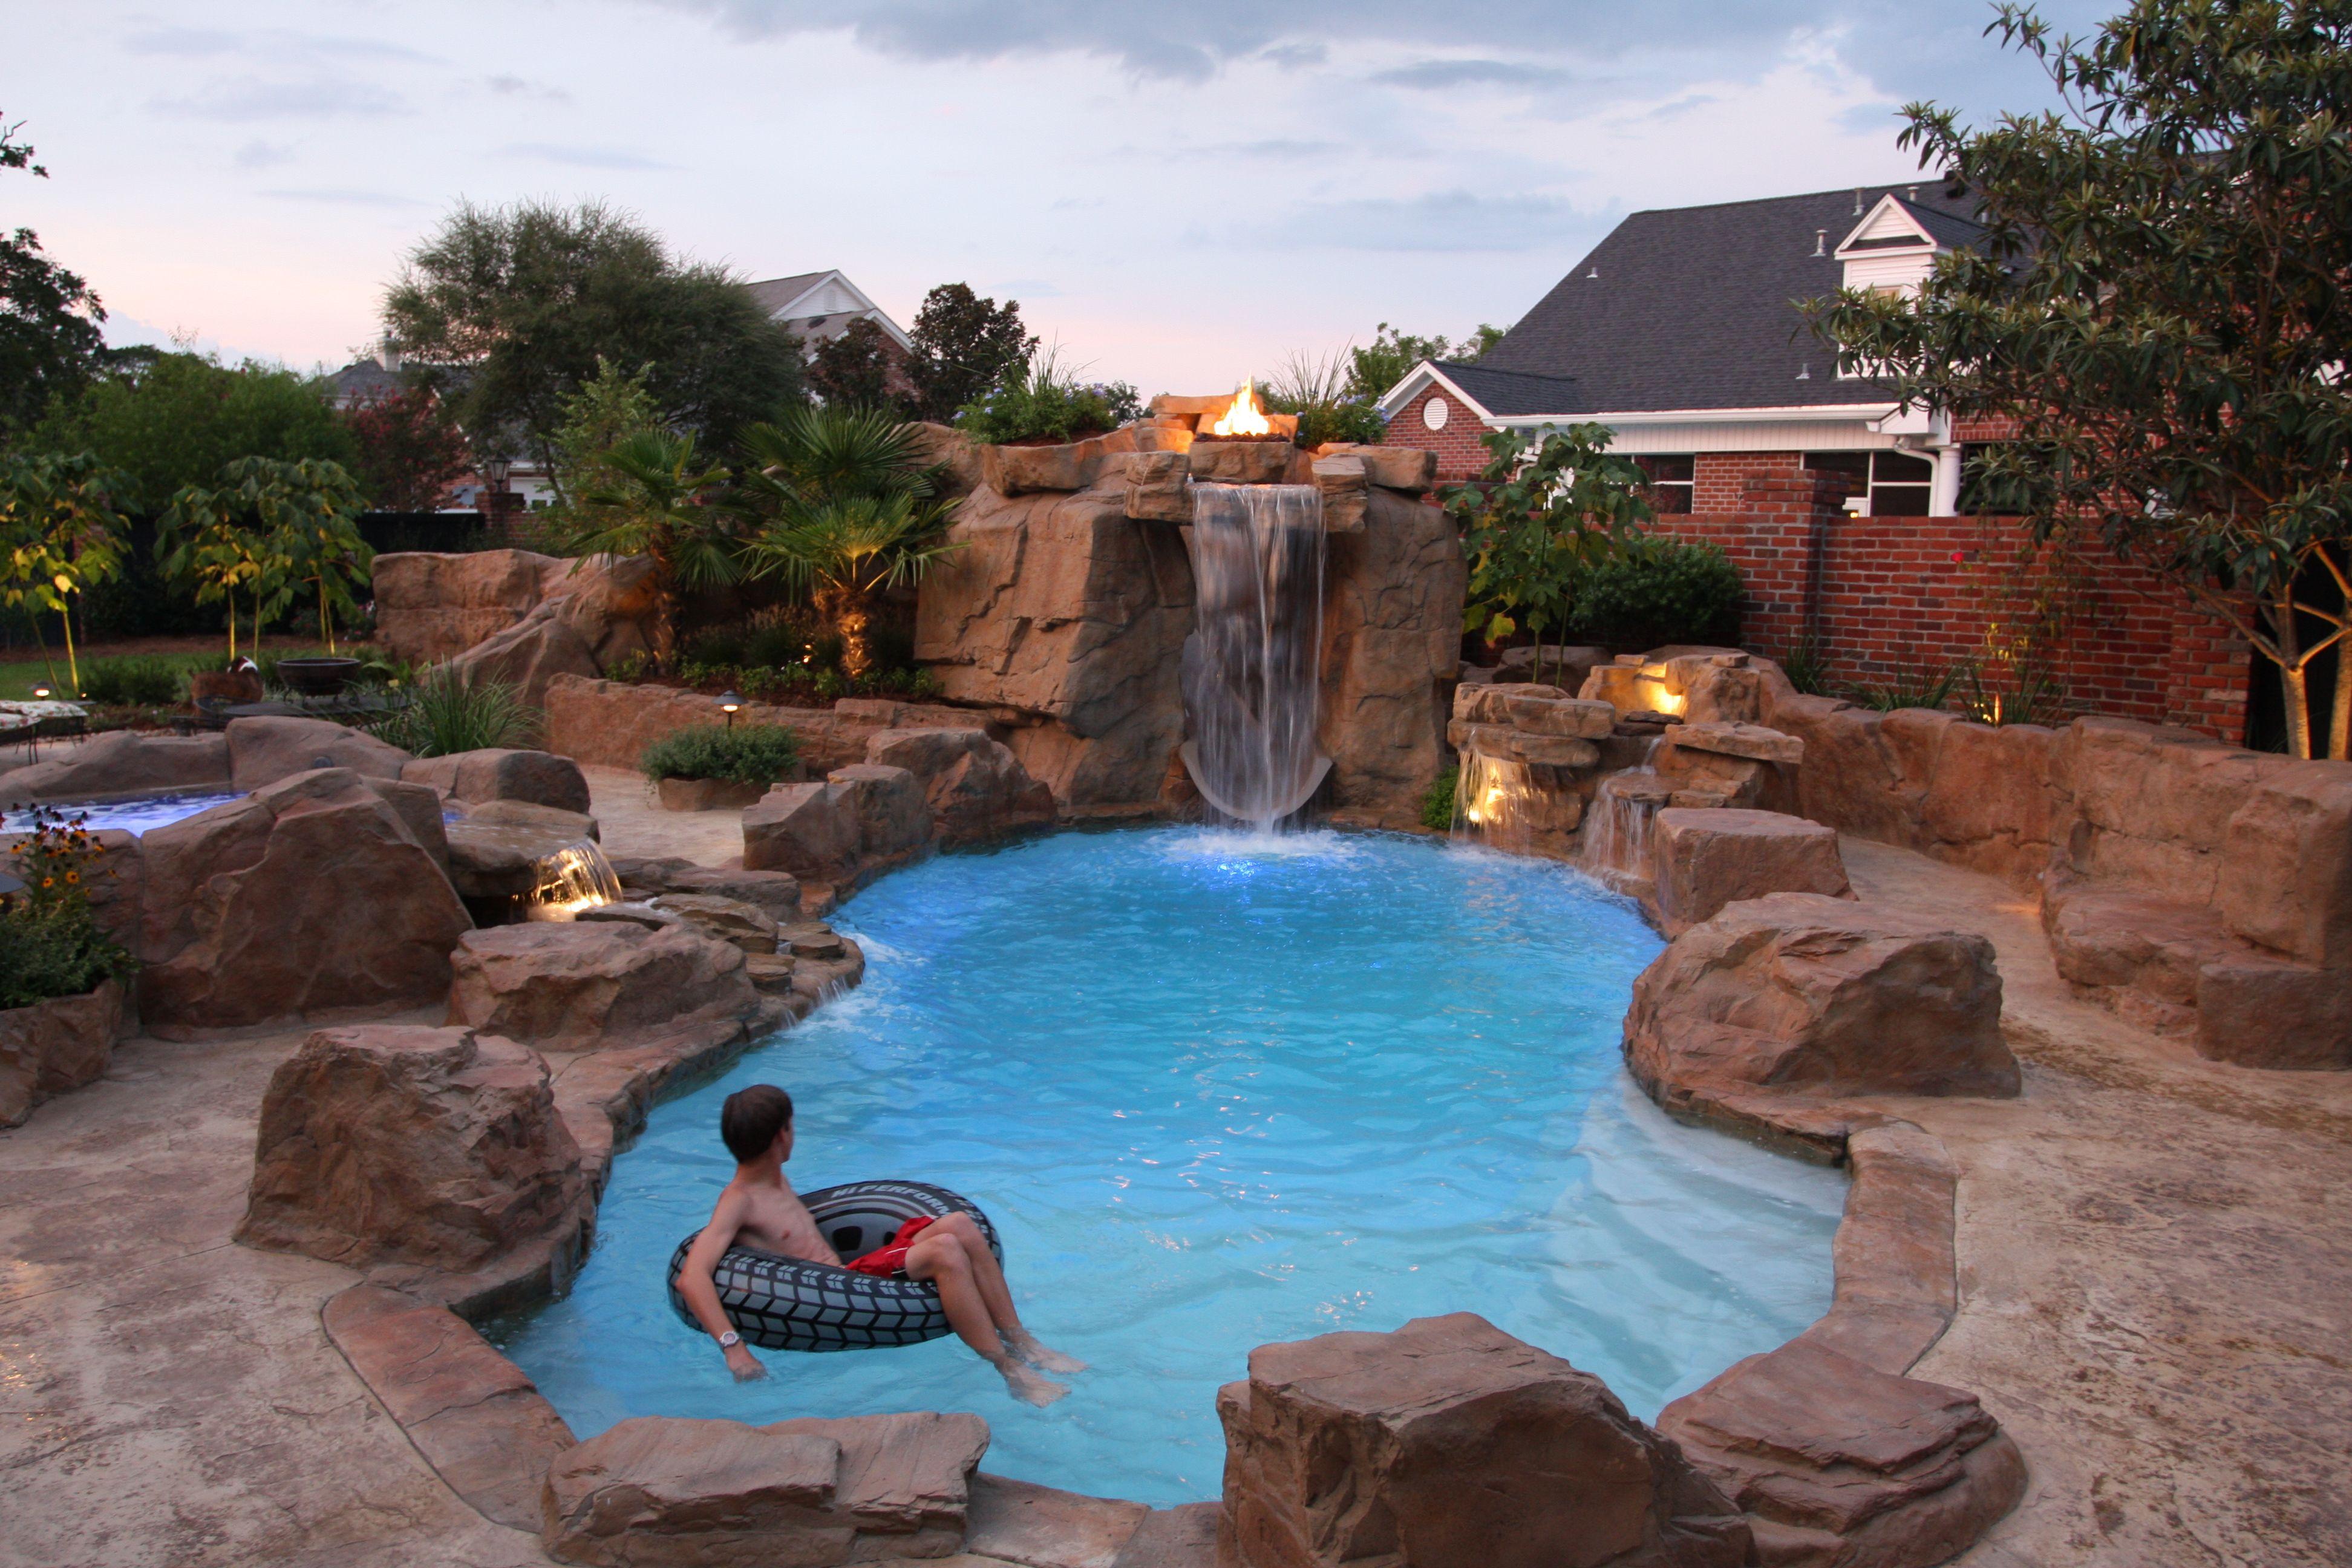 Boulders Around Pool Inground Fiberglass Swimming Poolroyal Fiberglass Pools A